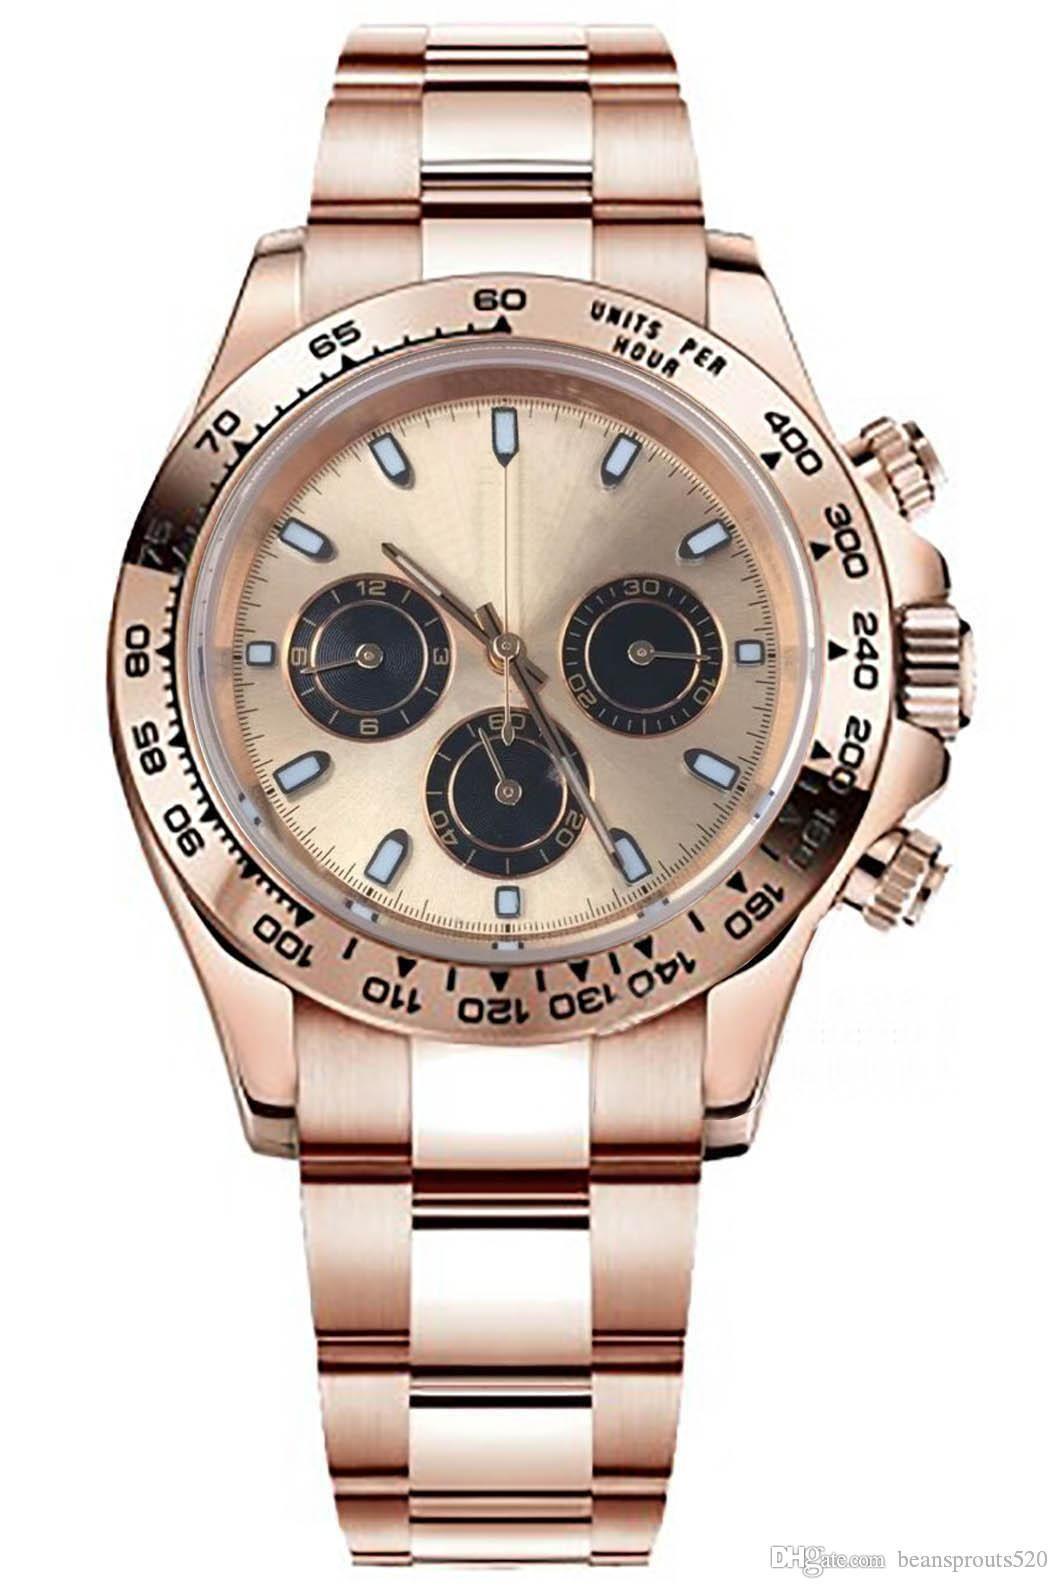 B45The Master Design Designer-Uhren Luxusuhr Bewegung Uhren, m116505 Serie Uhr, Fall Rose, Rose Edelstahlband, stieg dia